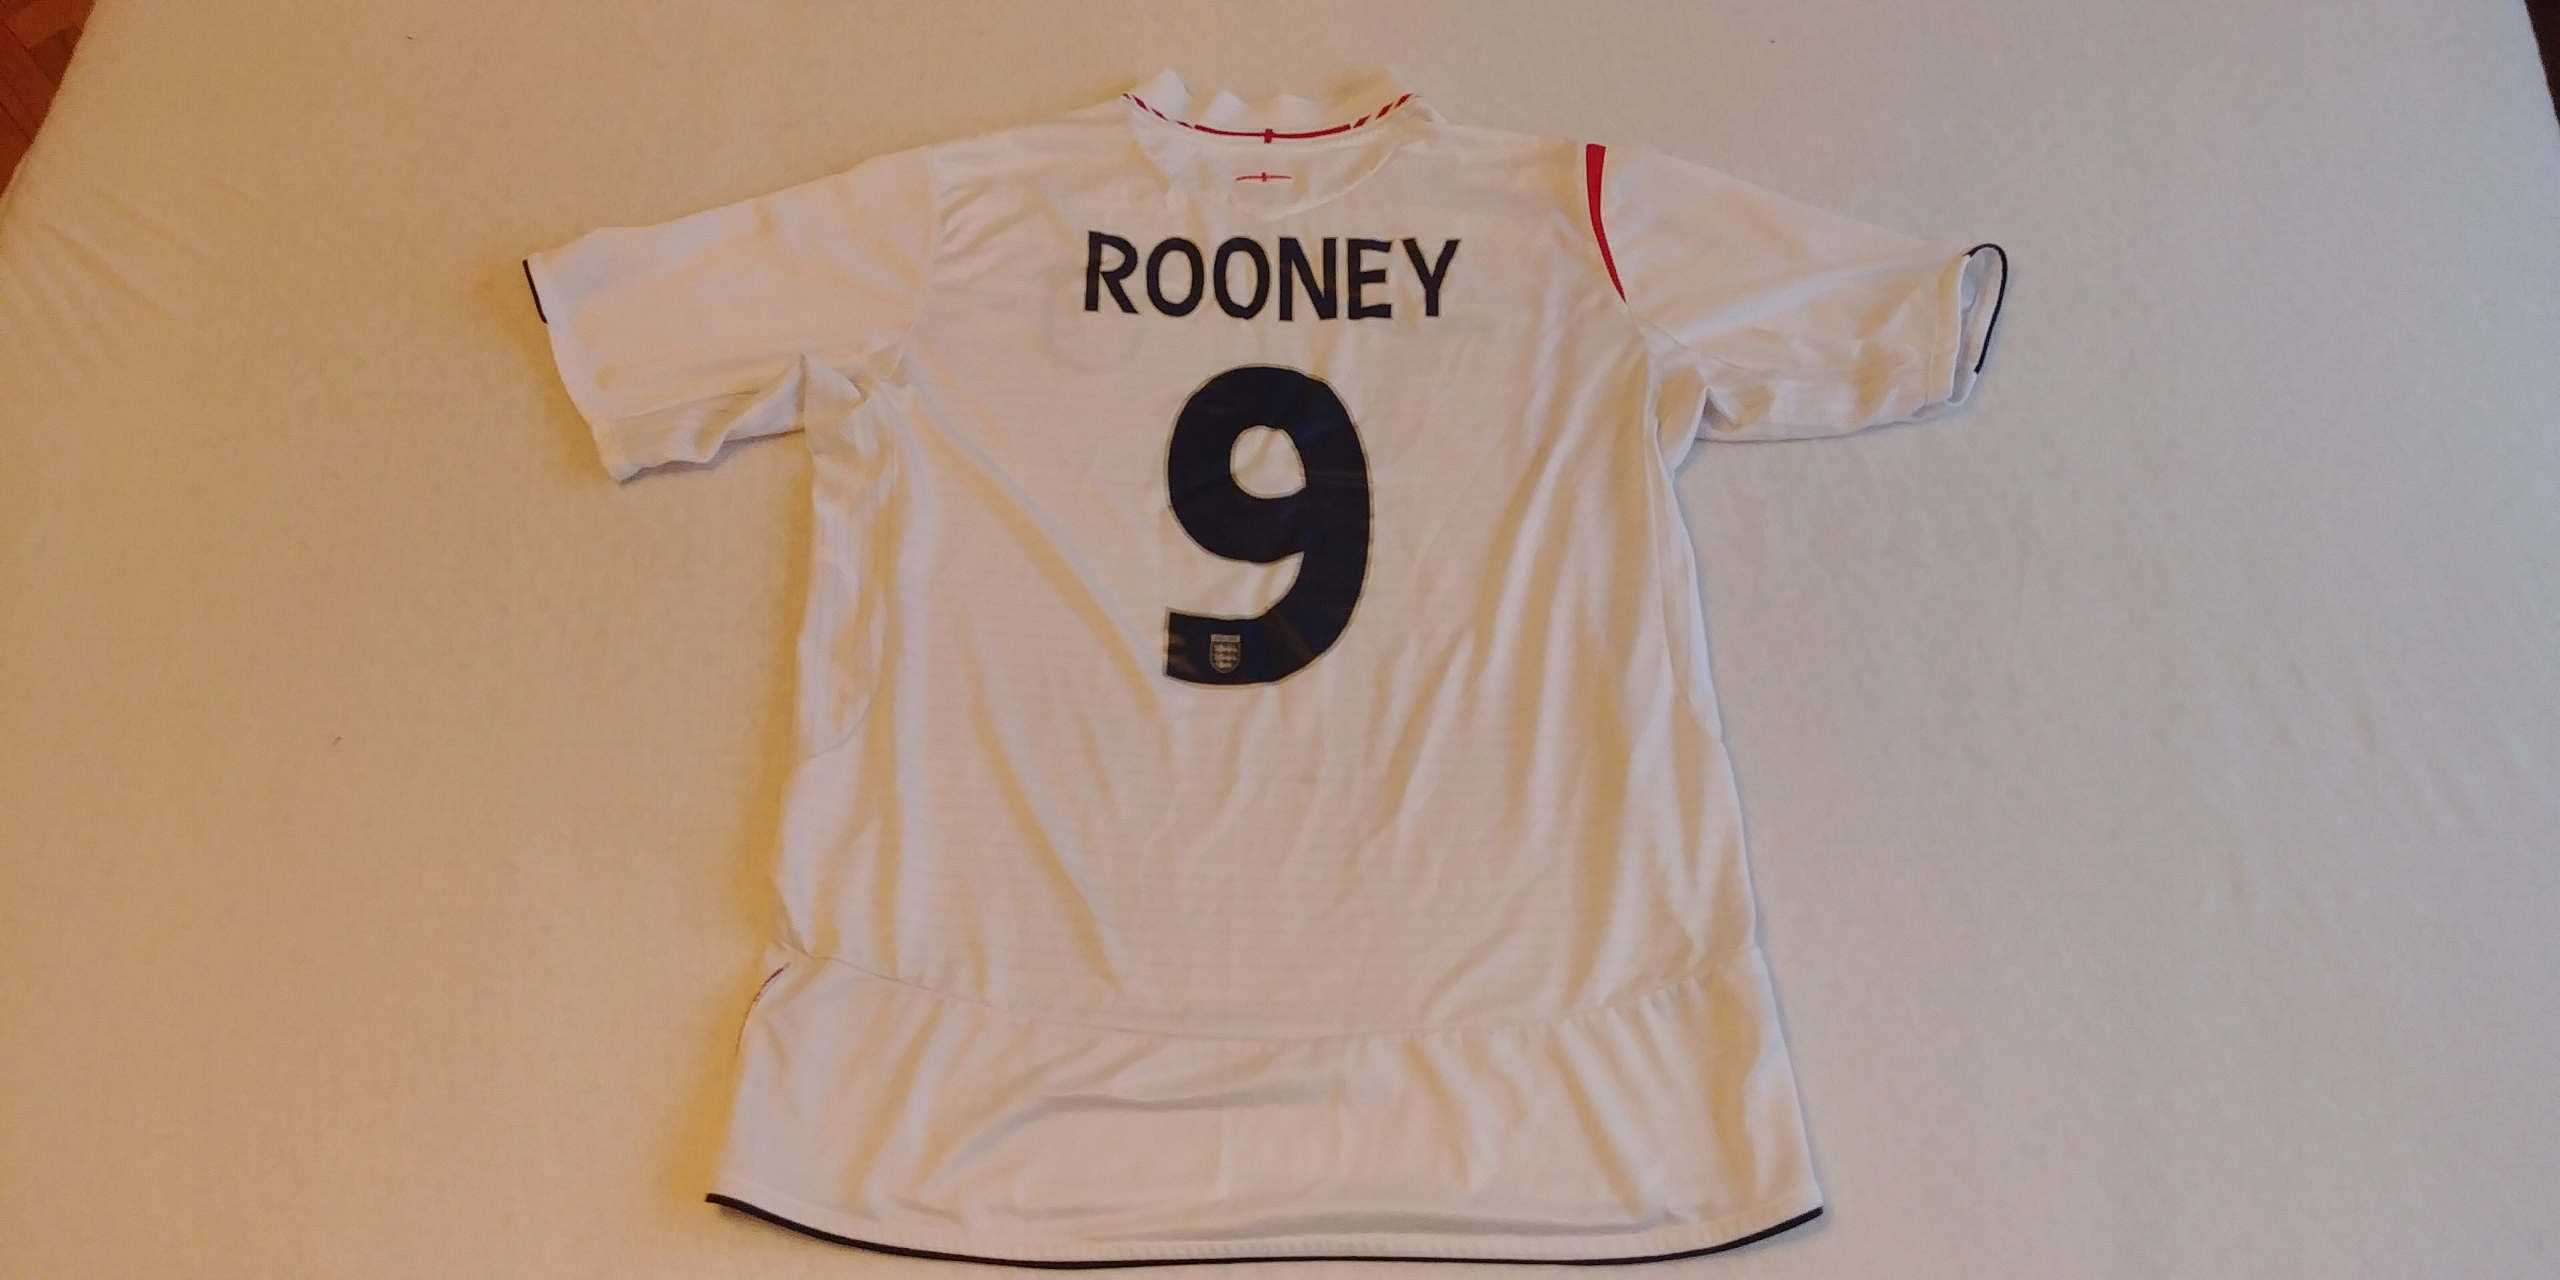 Koszulka Anglia - Rooney 2005/2007 *Umbro* (L)